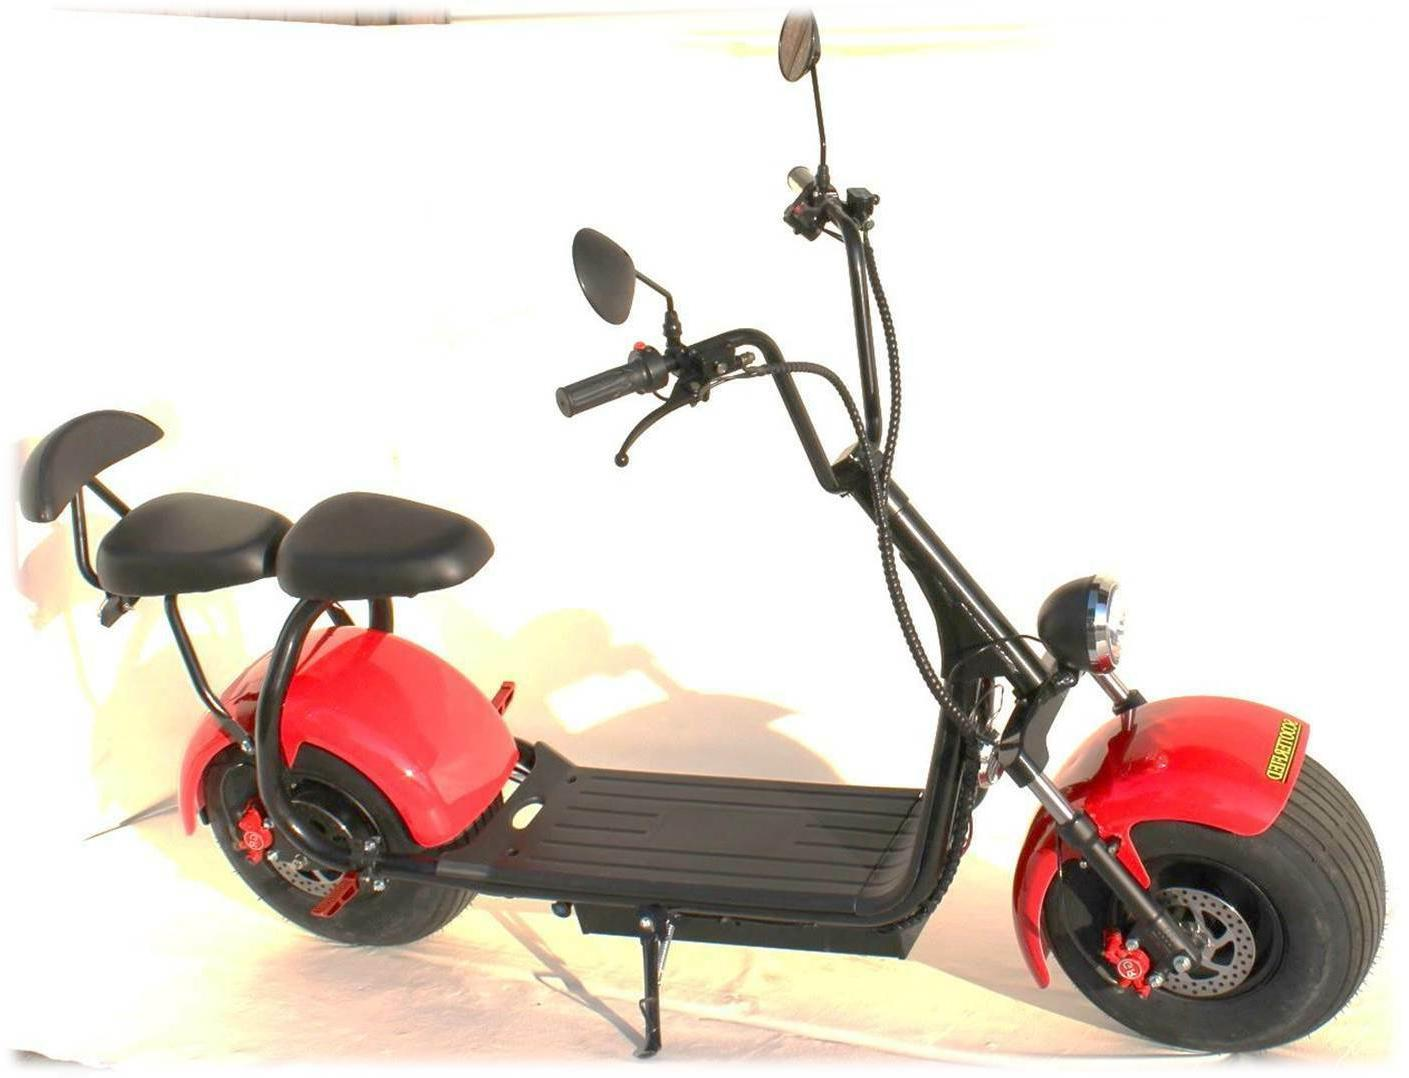 2 Seater Electric Scooterfied.com Chopper Bike watt